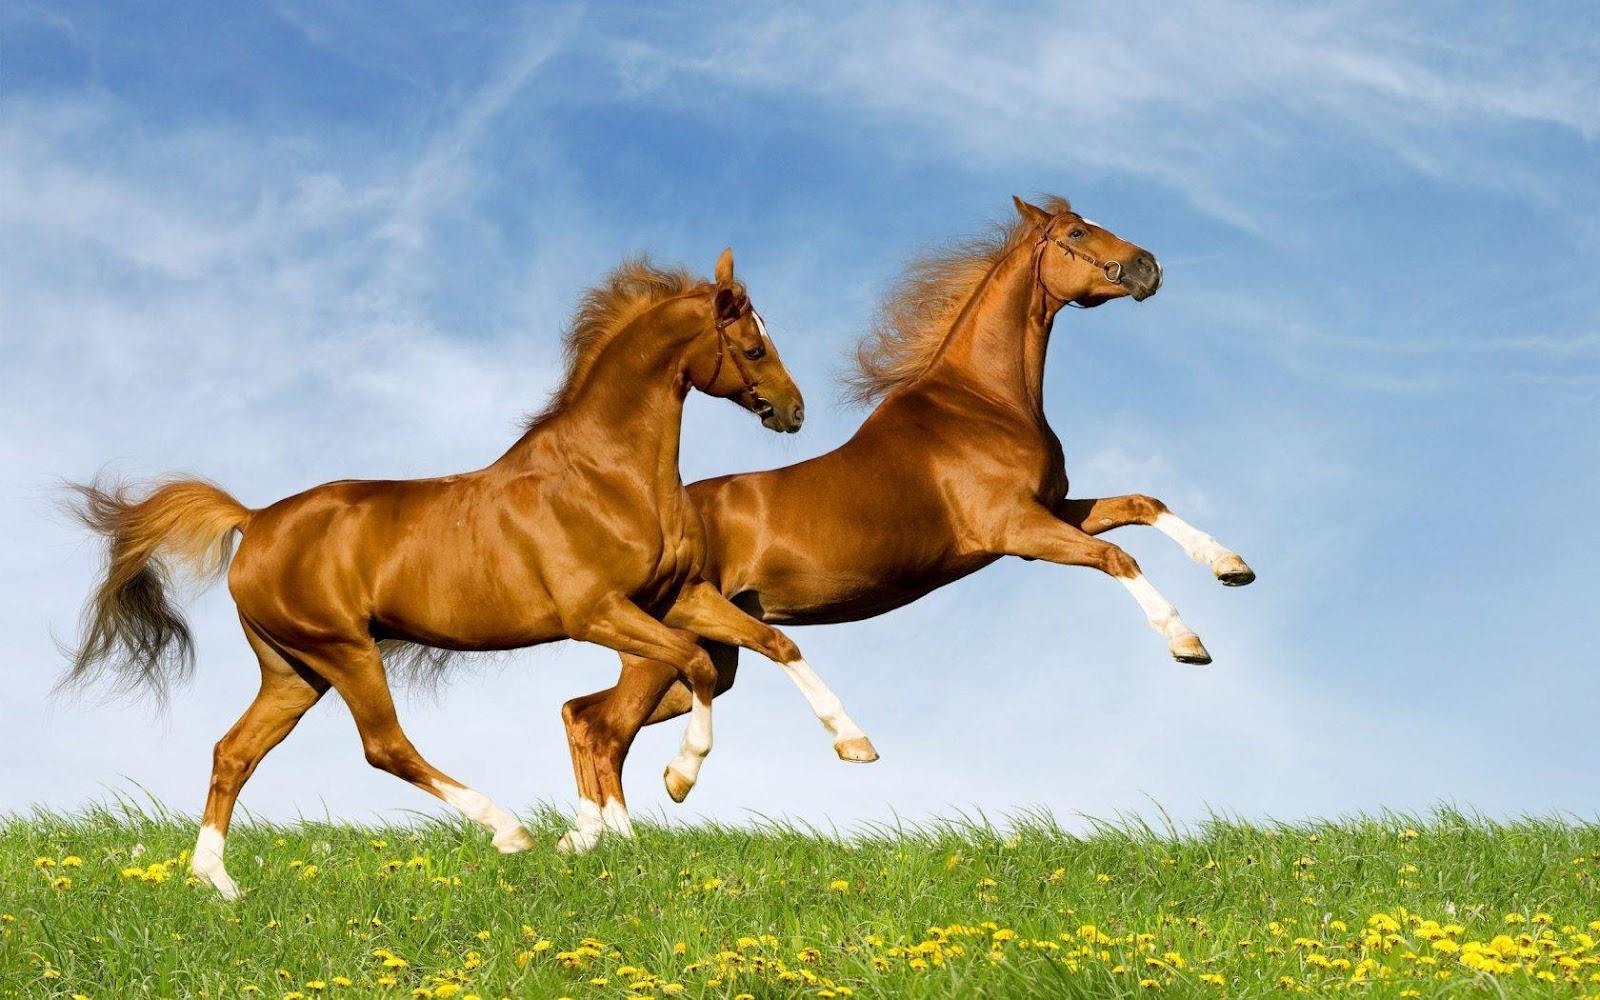 http://4.bp.blogspot.com/--ZLp383msN8/UCZxM69feOI/AAAAAAAAE70/uYRf2iw-kSU/s1600/two-horses-1680x1050.jpg